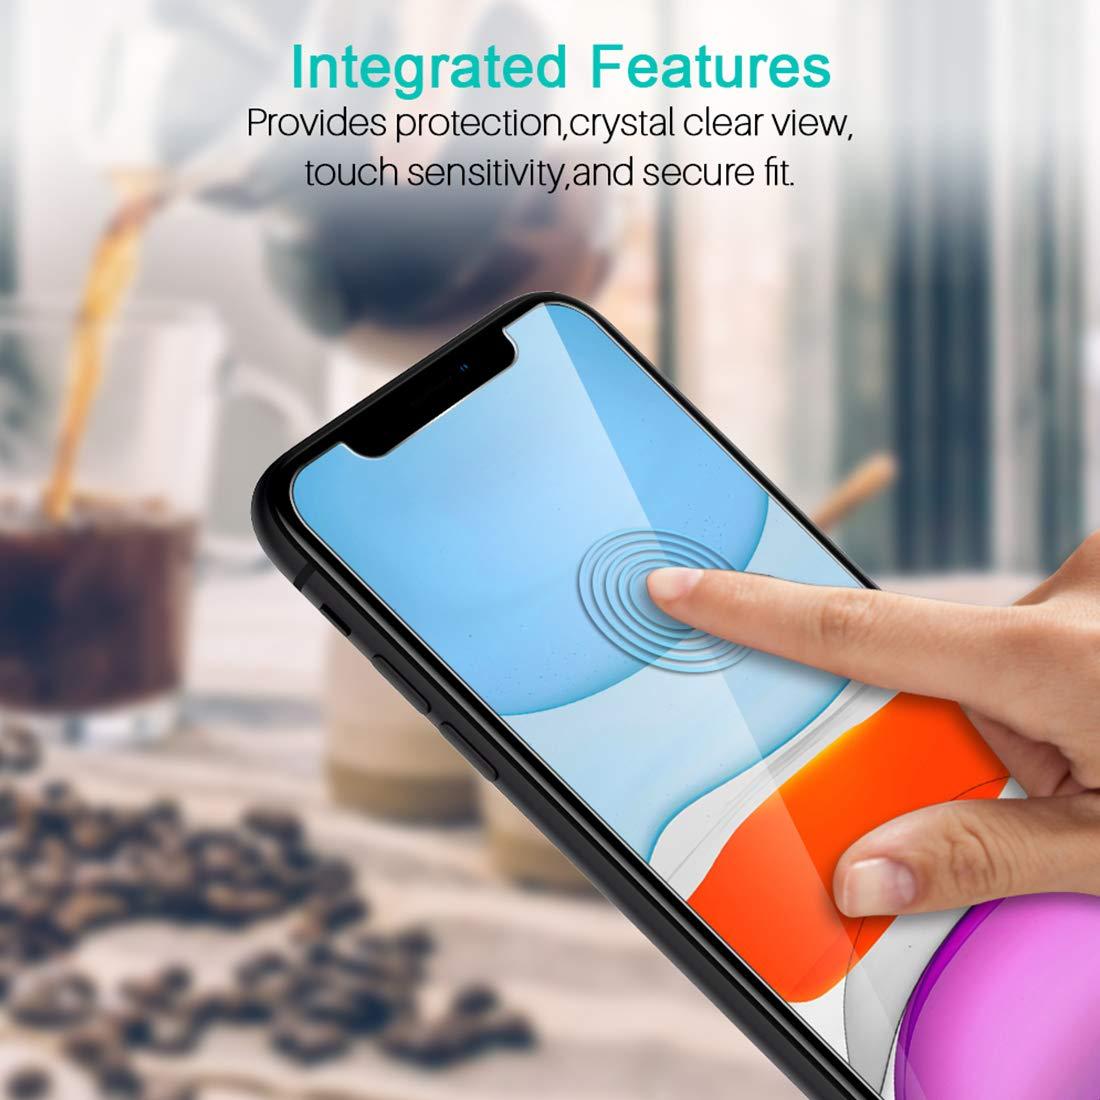 3 Pack Protector de Pantalla para iPhone XR 6.1, Cristal Vidrio Templado Templada LK Compatible con Funda Touch 3D Garant/ía Vitalicia De Sustituci/ón F/ácil de Instalar Screen Protector